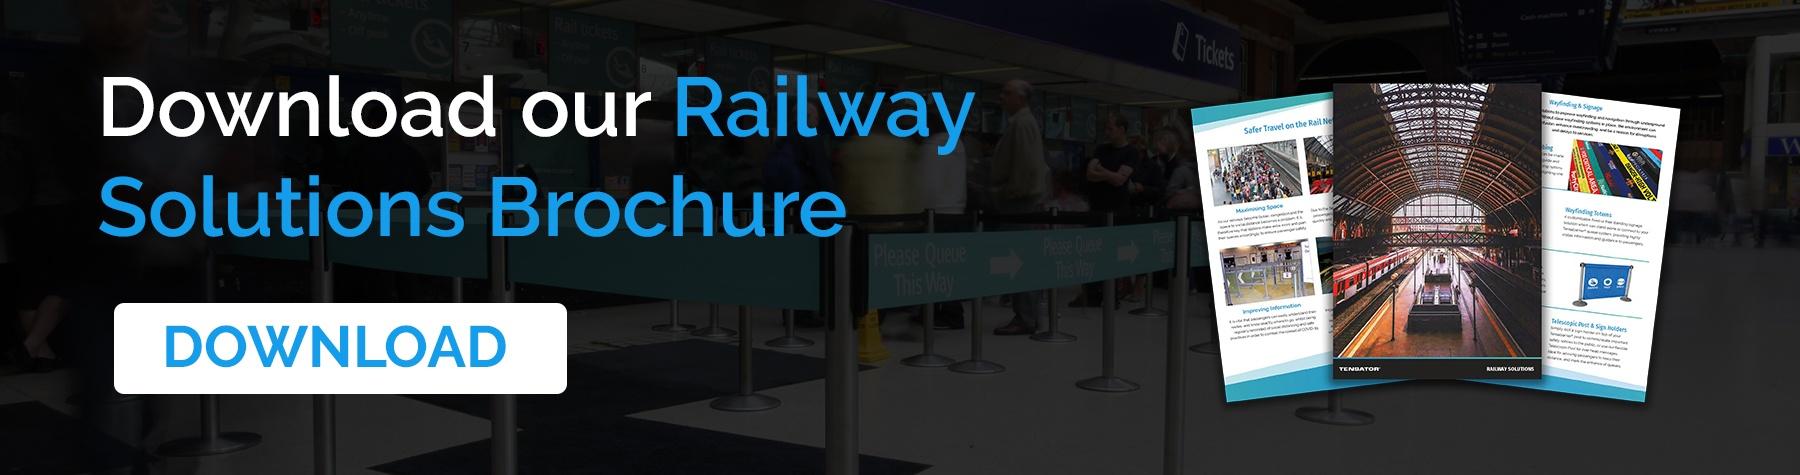 Railway Queue Solutions